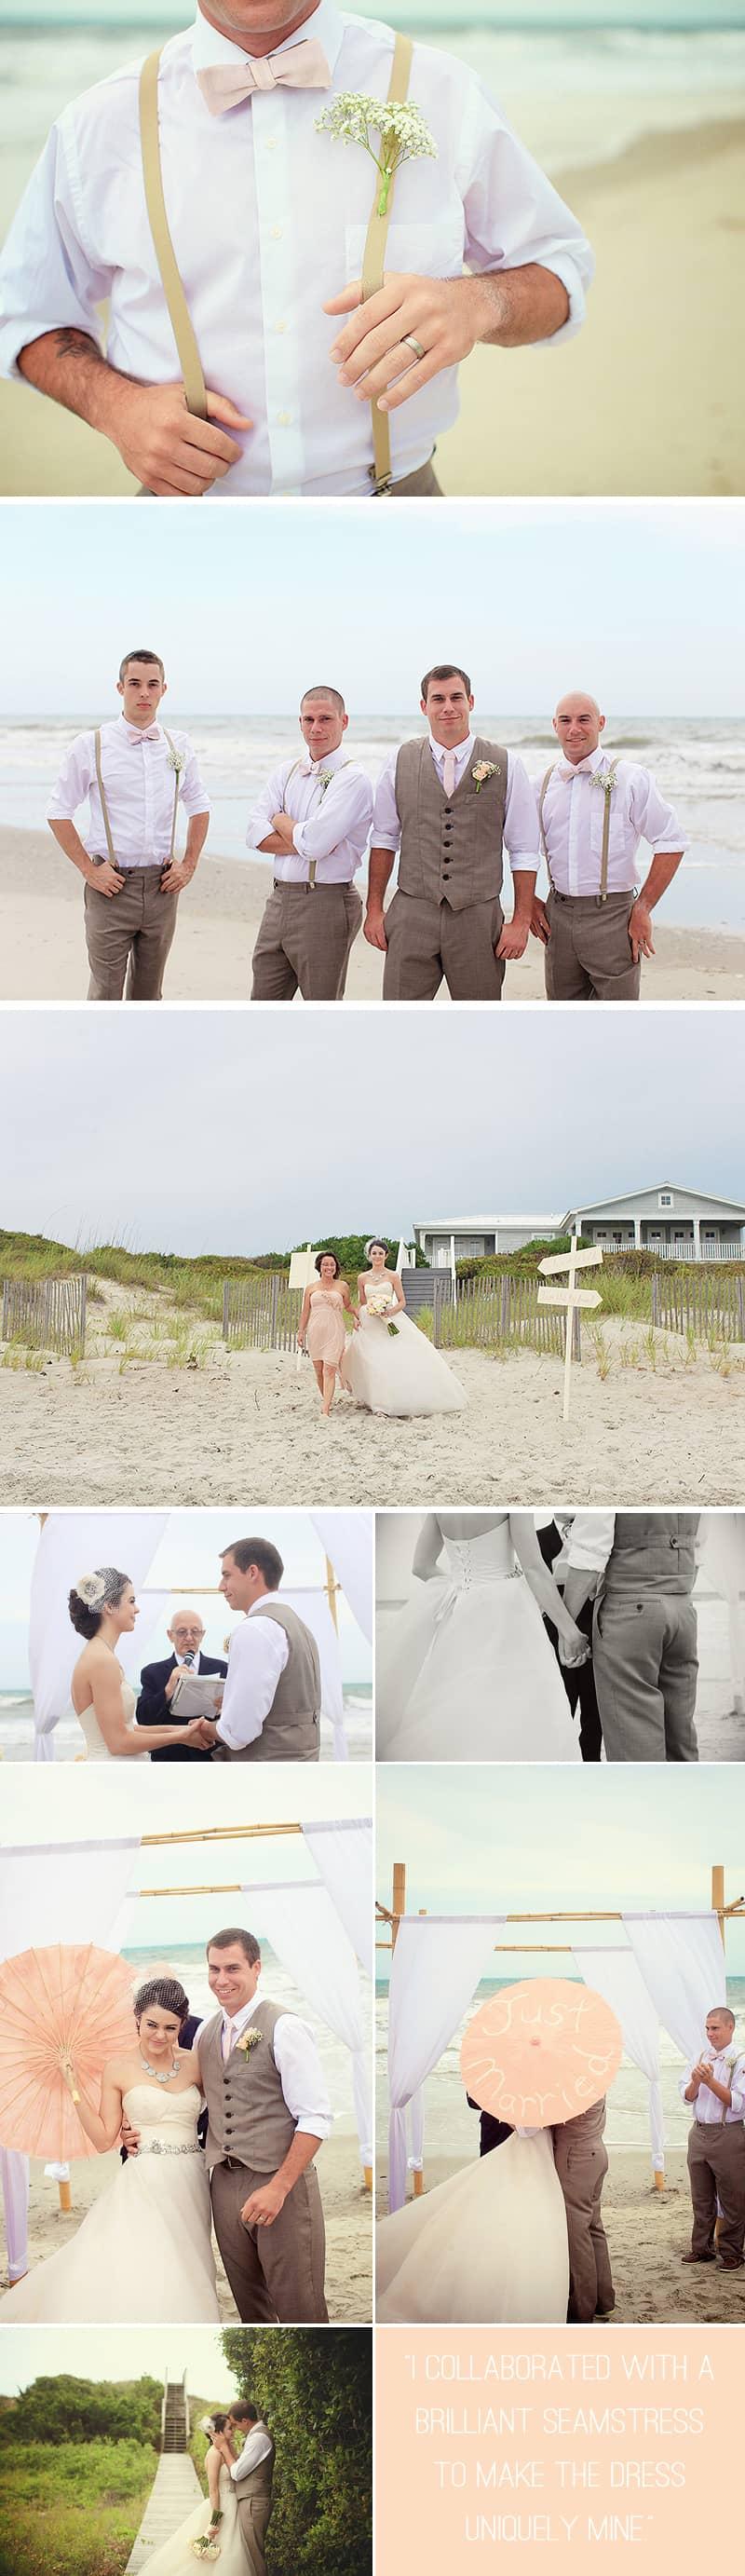 An Intimate Beach Wedding 1